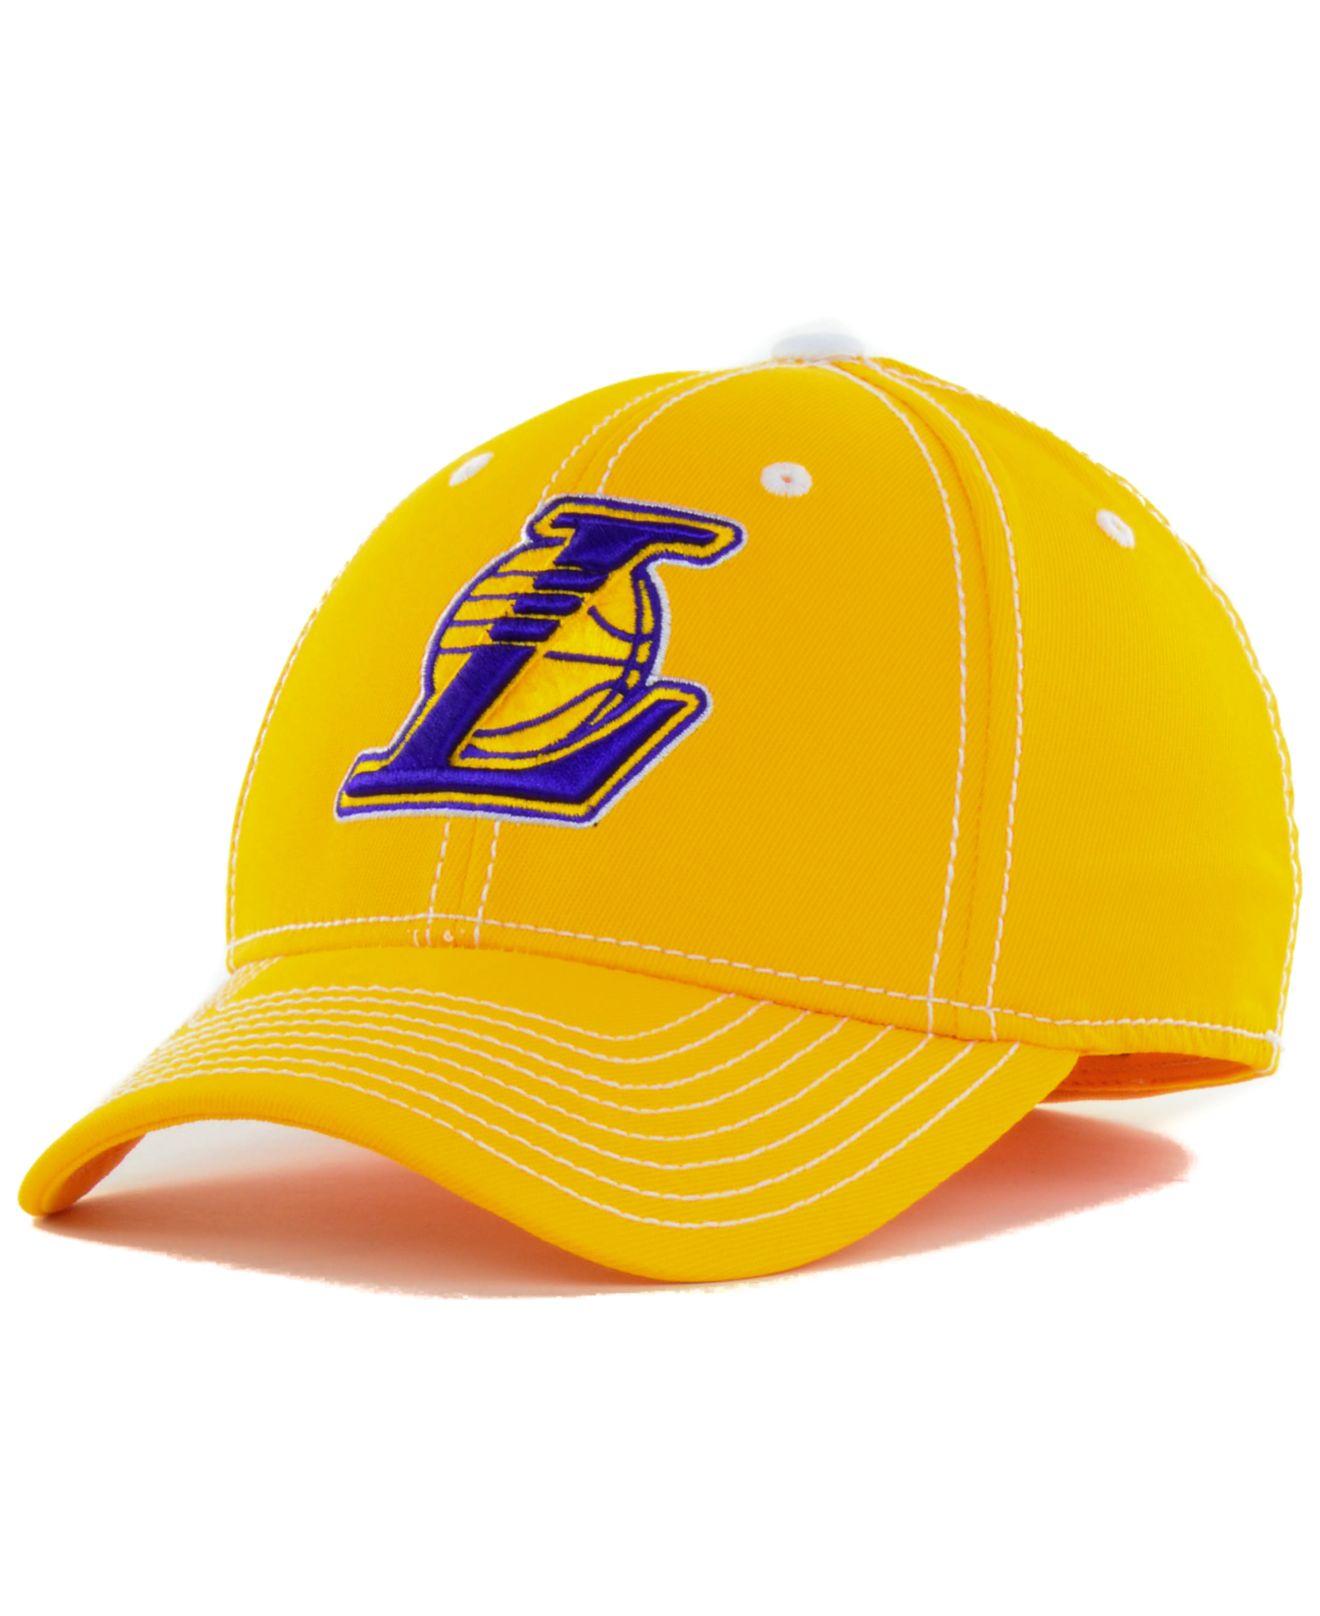 Lyst - adidas Los Angeles Lakers Nba Primary Team Flex Cap in Yellow ... 147bd0db987